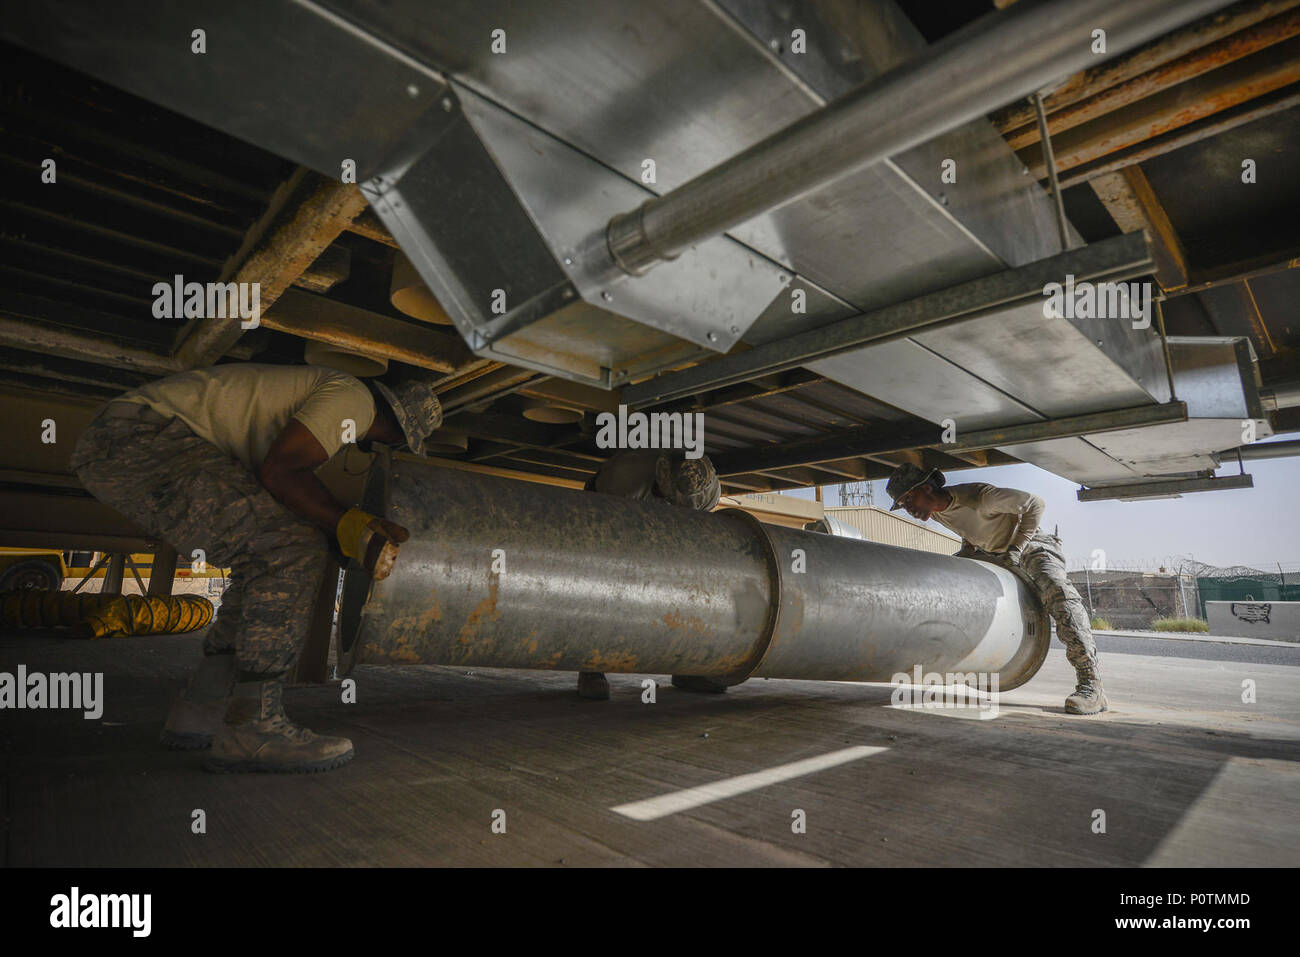 407th Aeg Stockfotos & 407th Aeg Bilder - Alamy